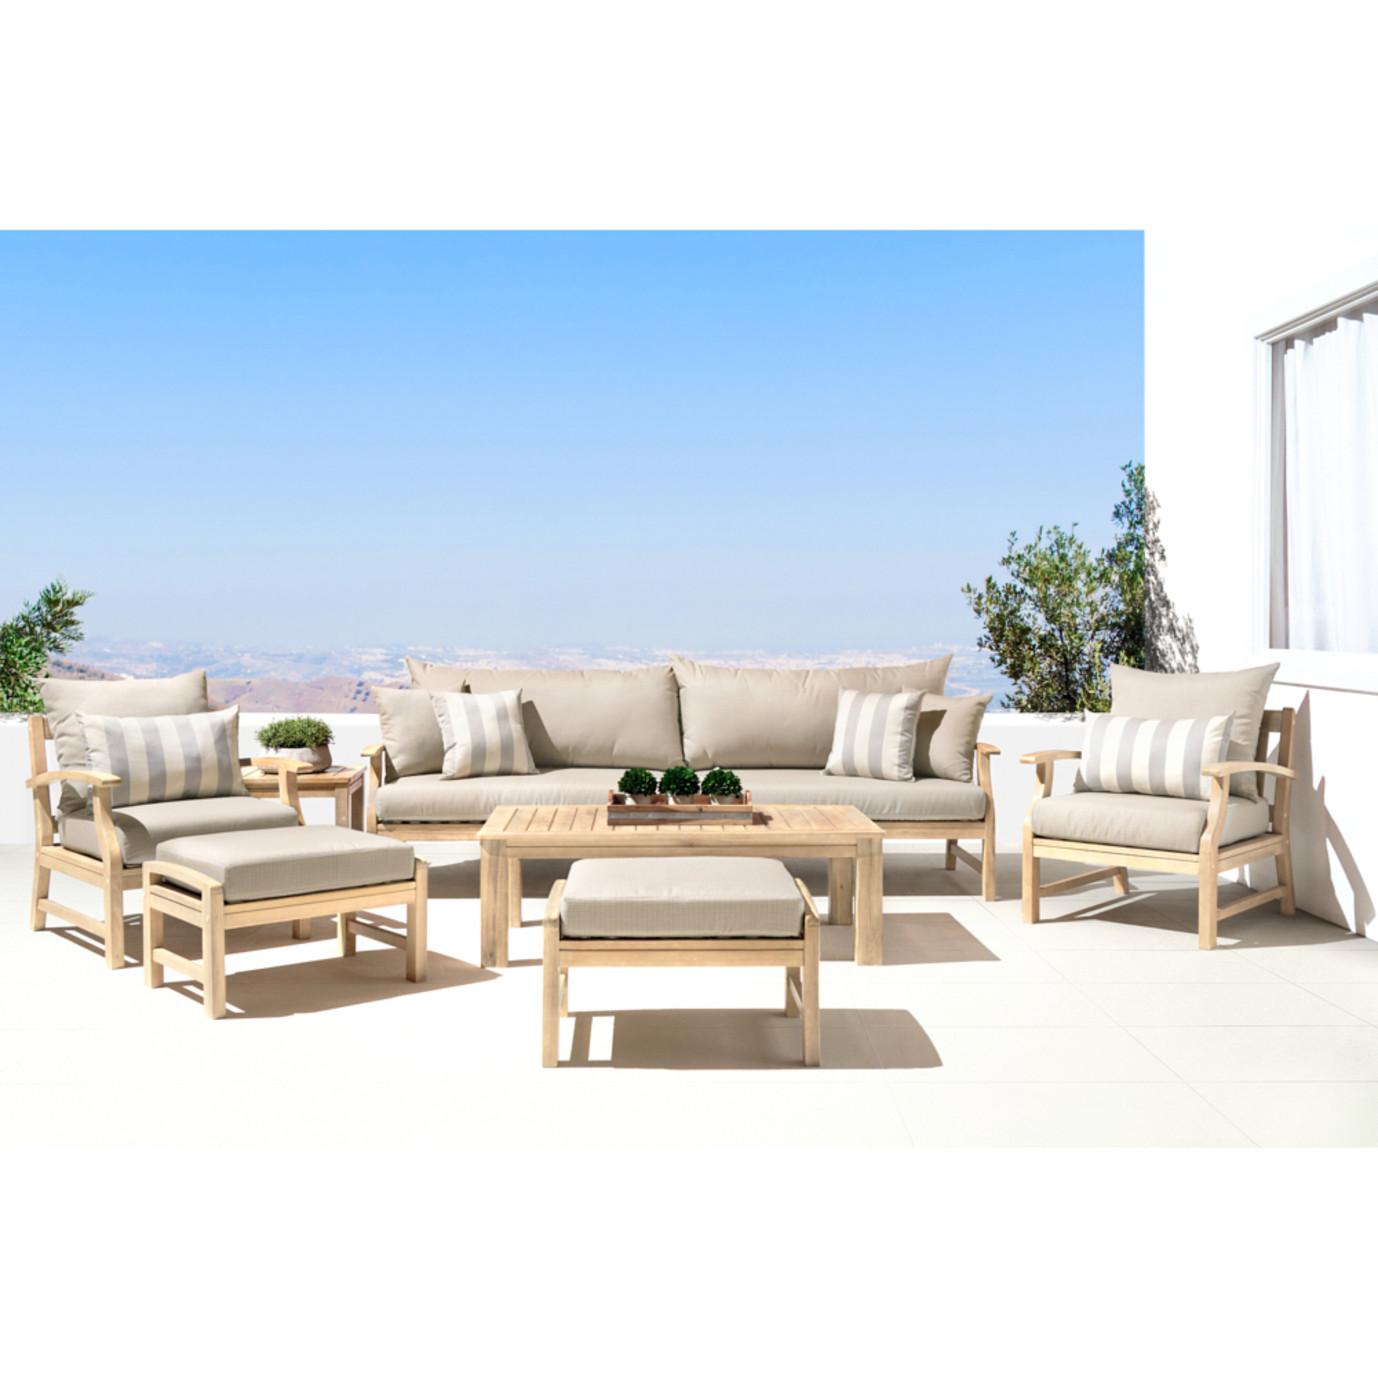 Kooper 8 Piece Sofa & Club Chair Set - Slate Gray